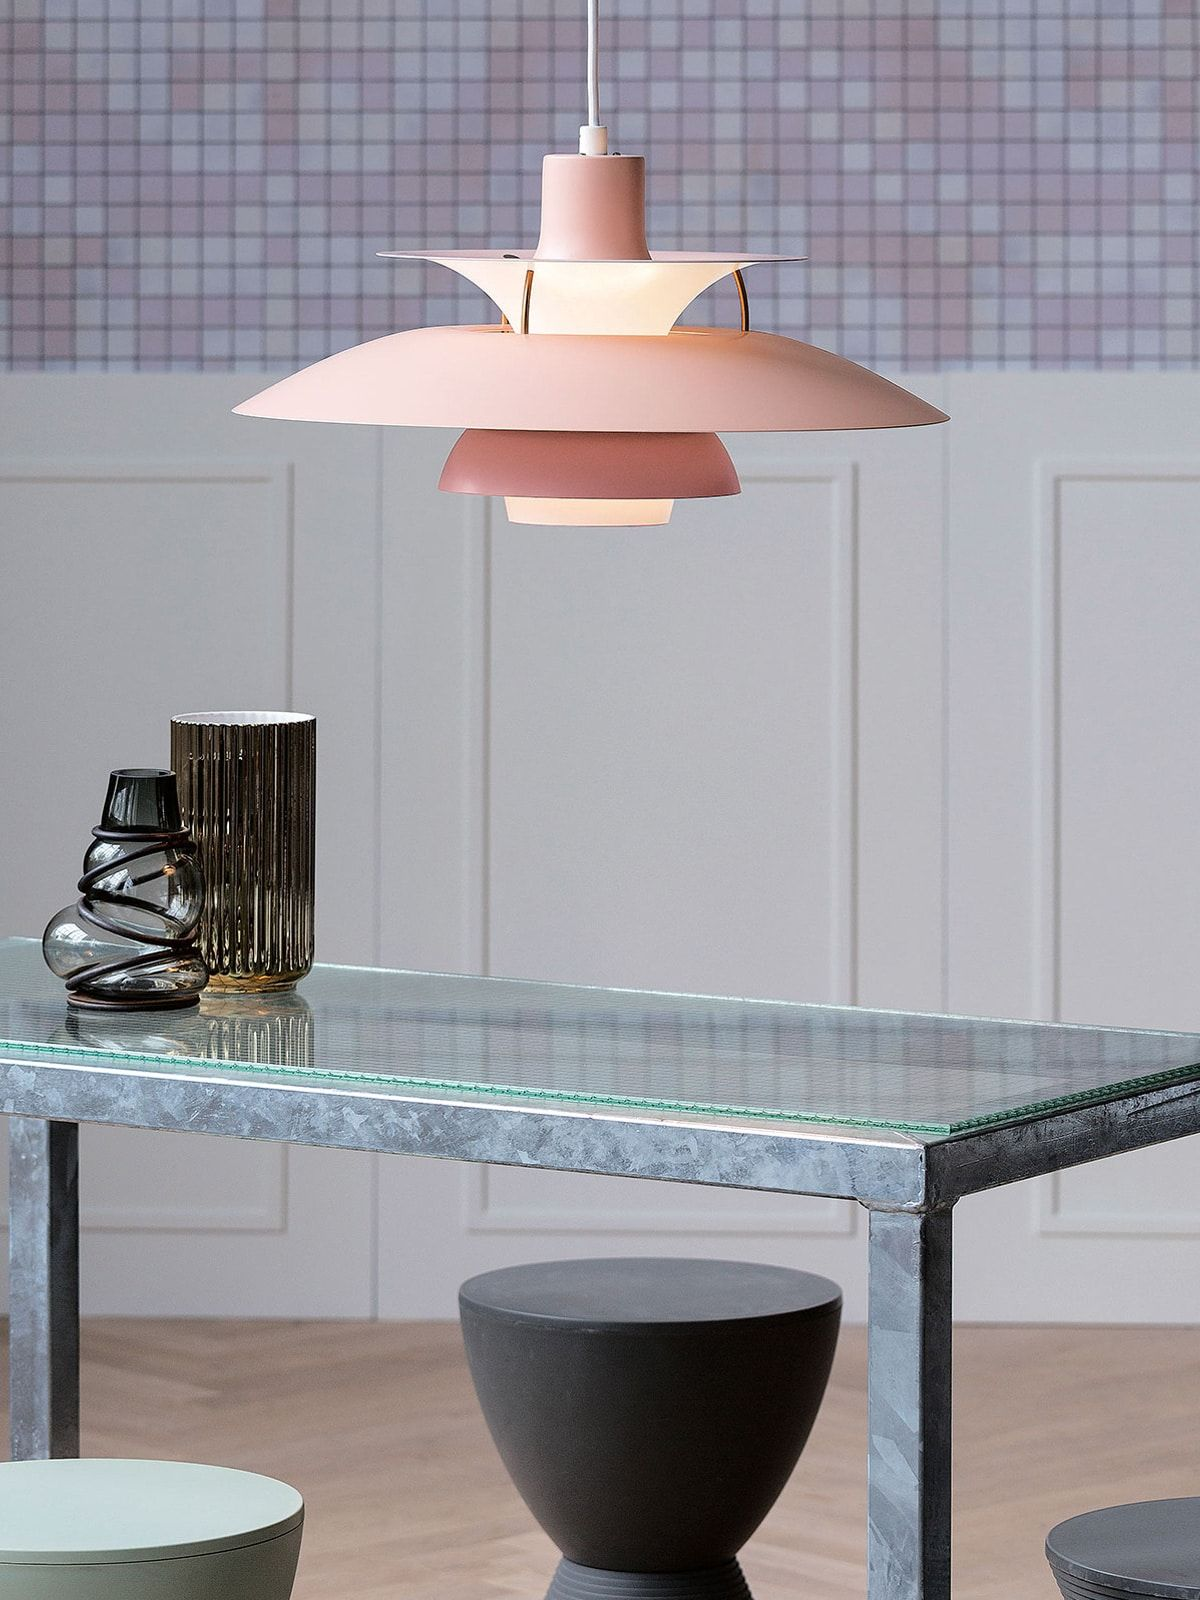 Ph 5 skandinavische design leuchten scandinavian for Designerleuchten esszimmer